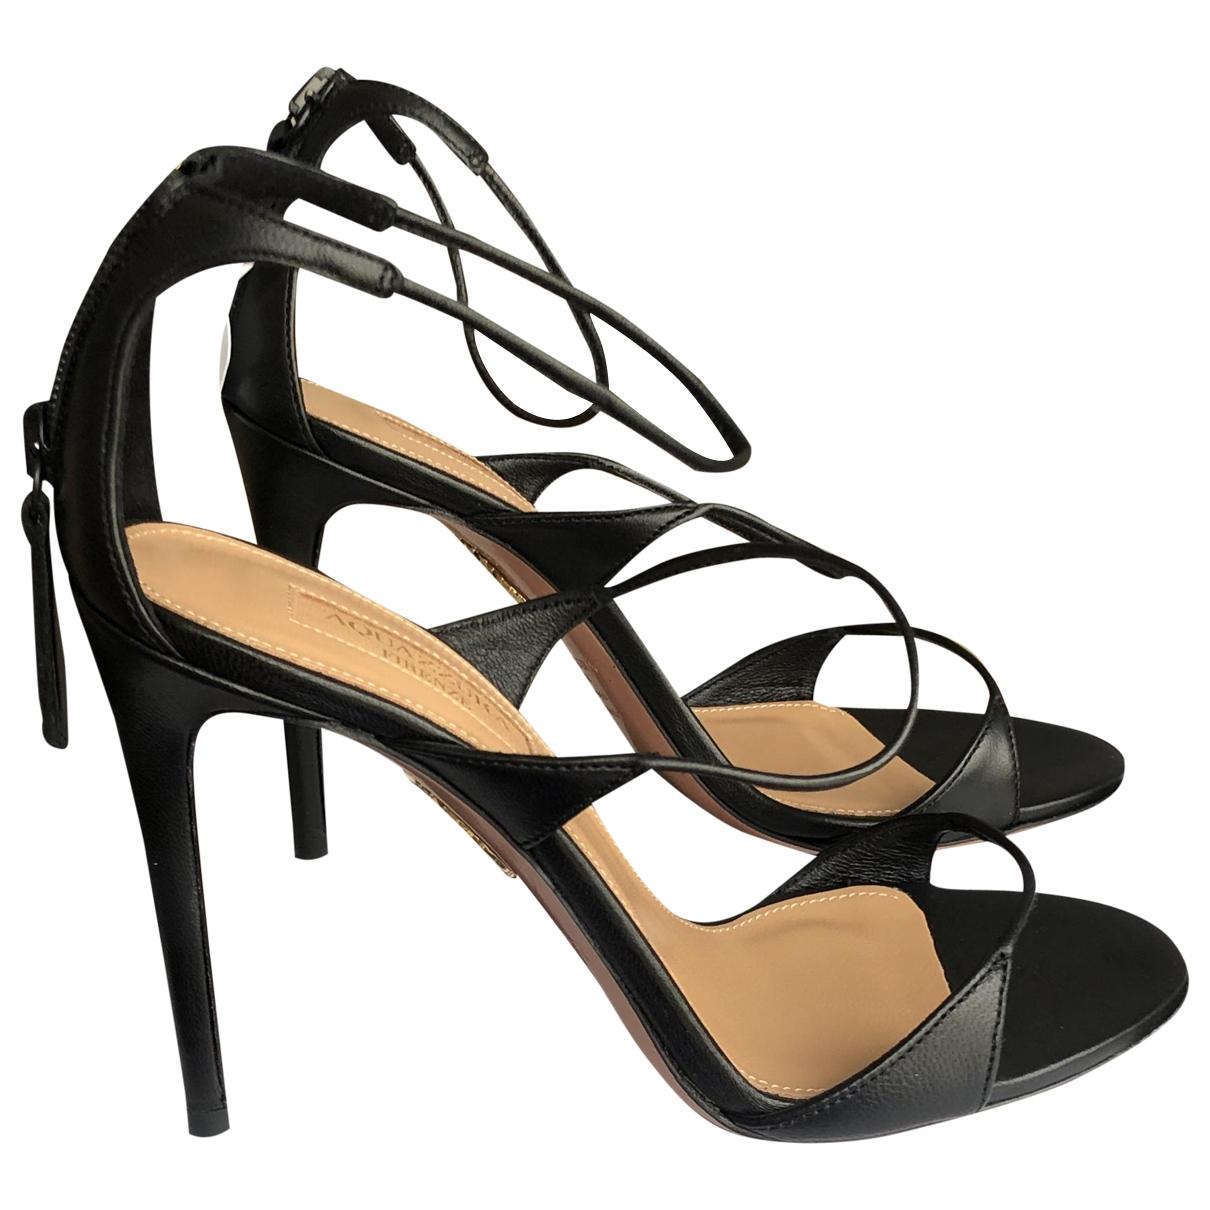 Aquazzura \N Black Leather Sandals for Women 36 EU